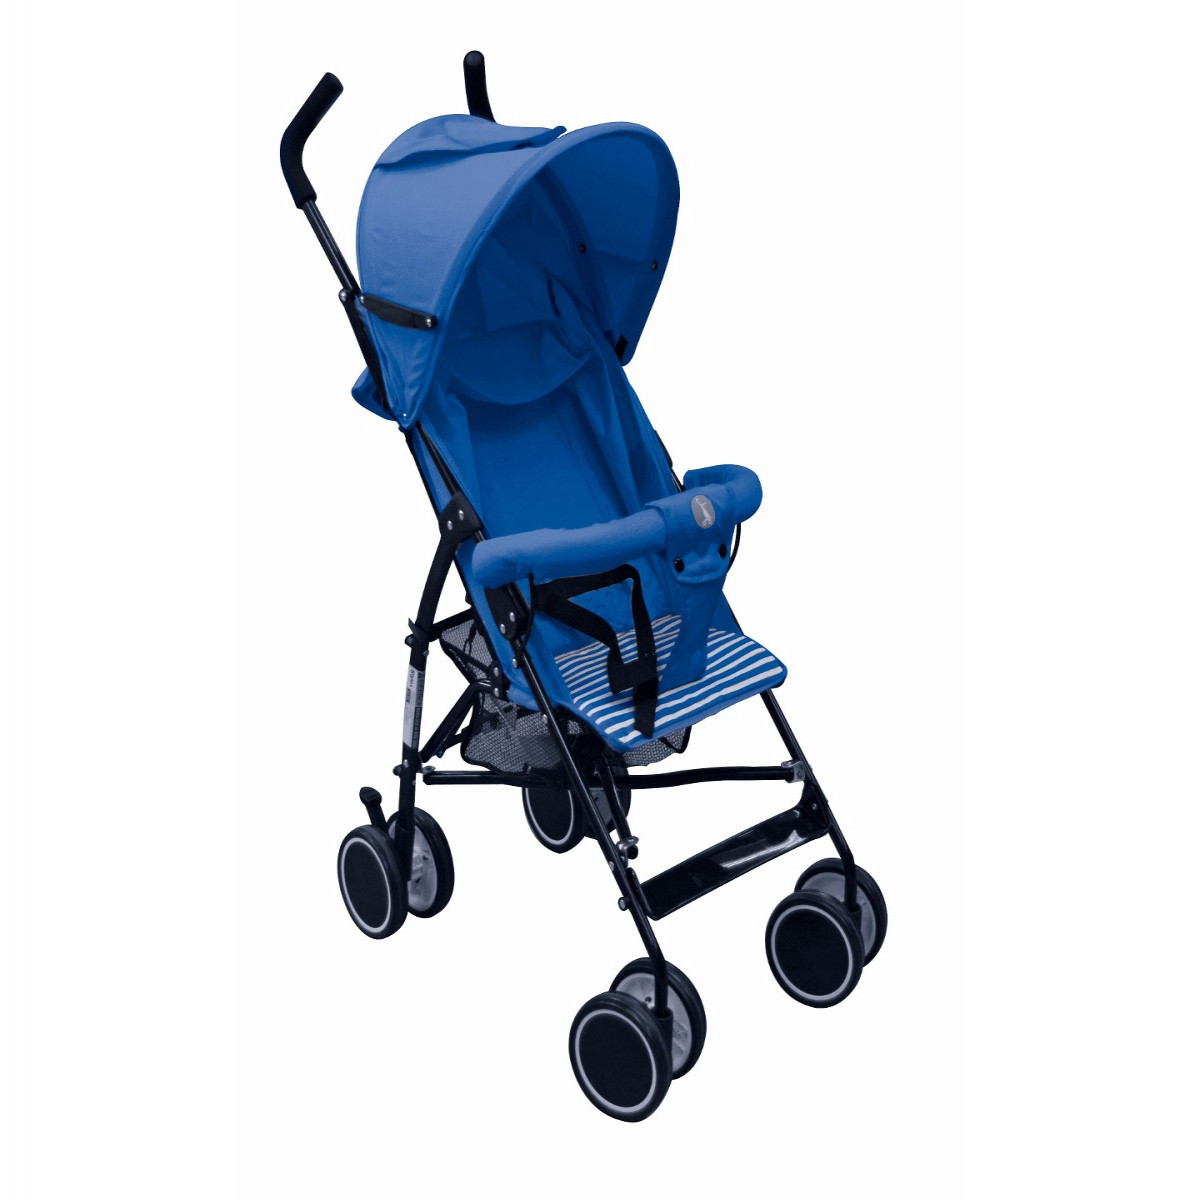 Paragüita Stylo Infanti azul